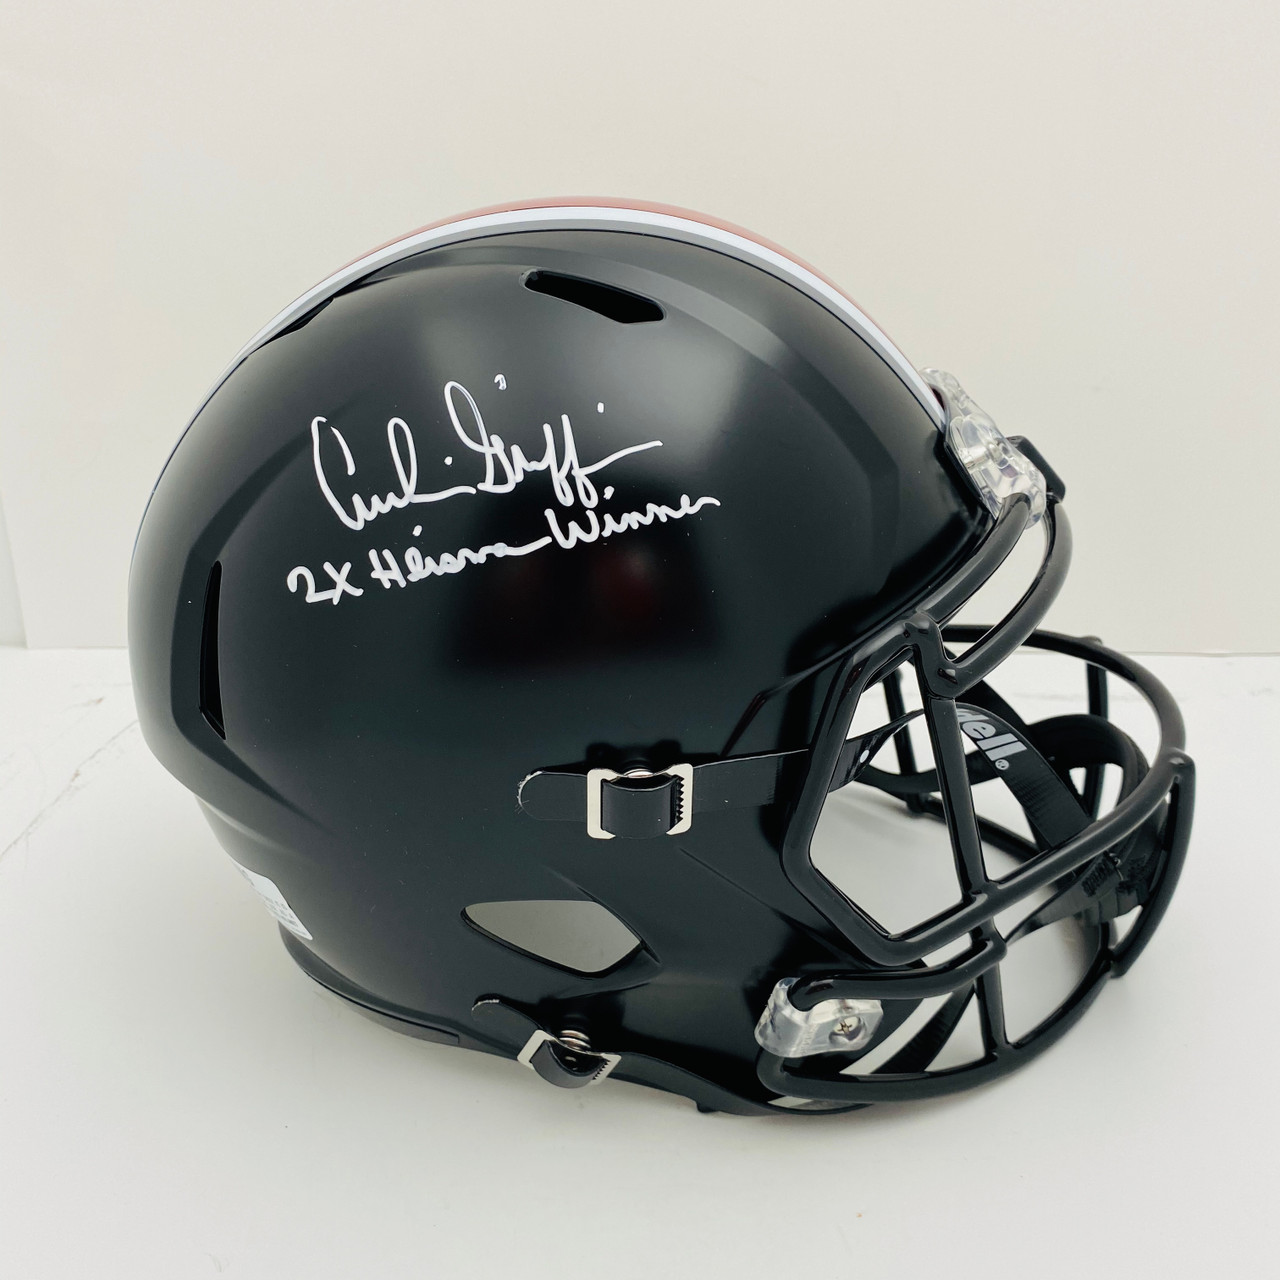 Archie Griffin Ohio State Buckeyes  '2x Heisman Winner' Autographed Black Replica Helmet - Certified Authentic